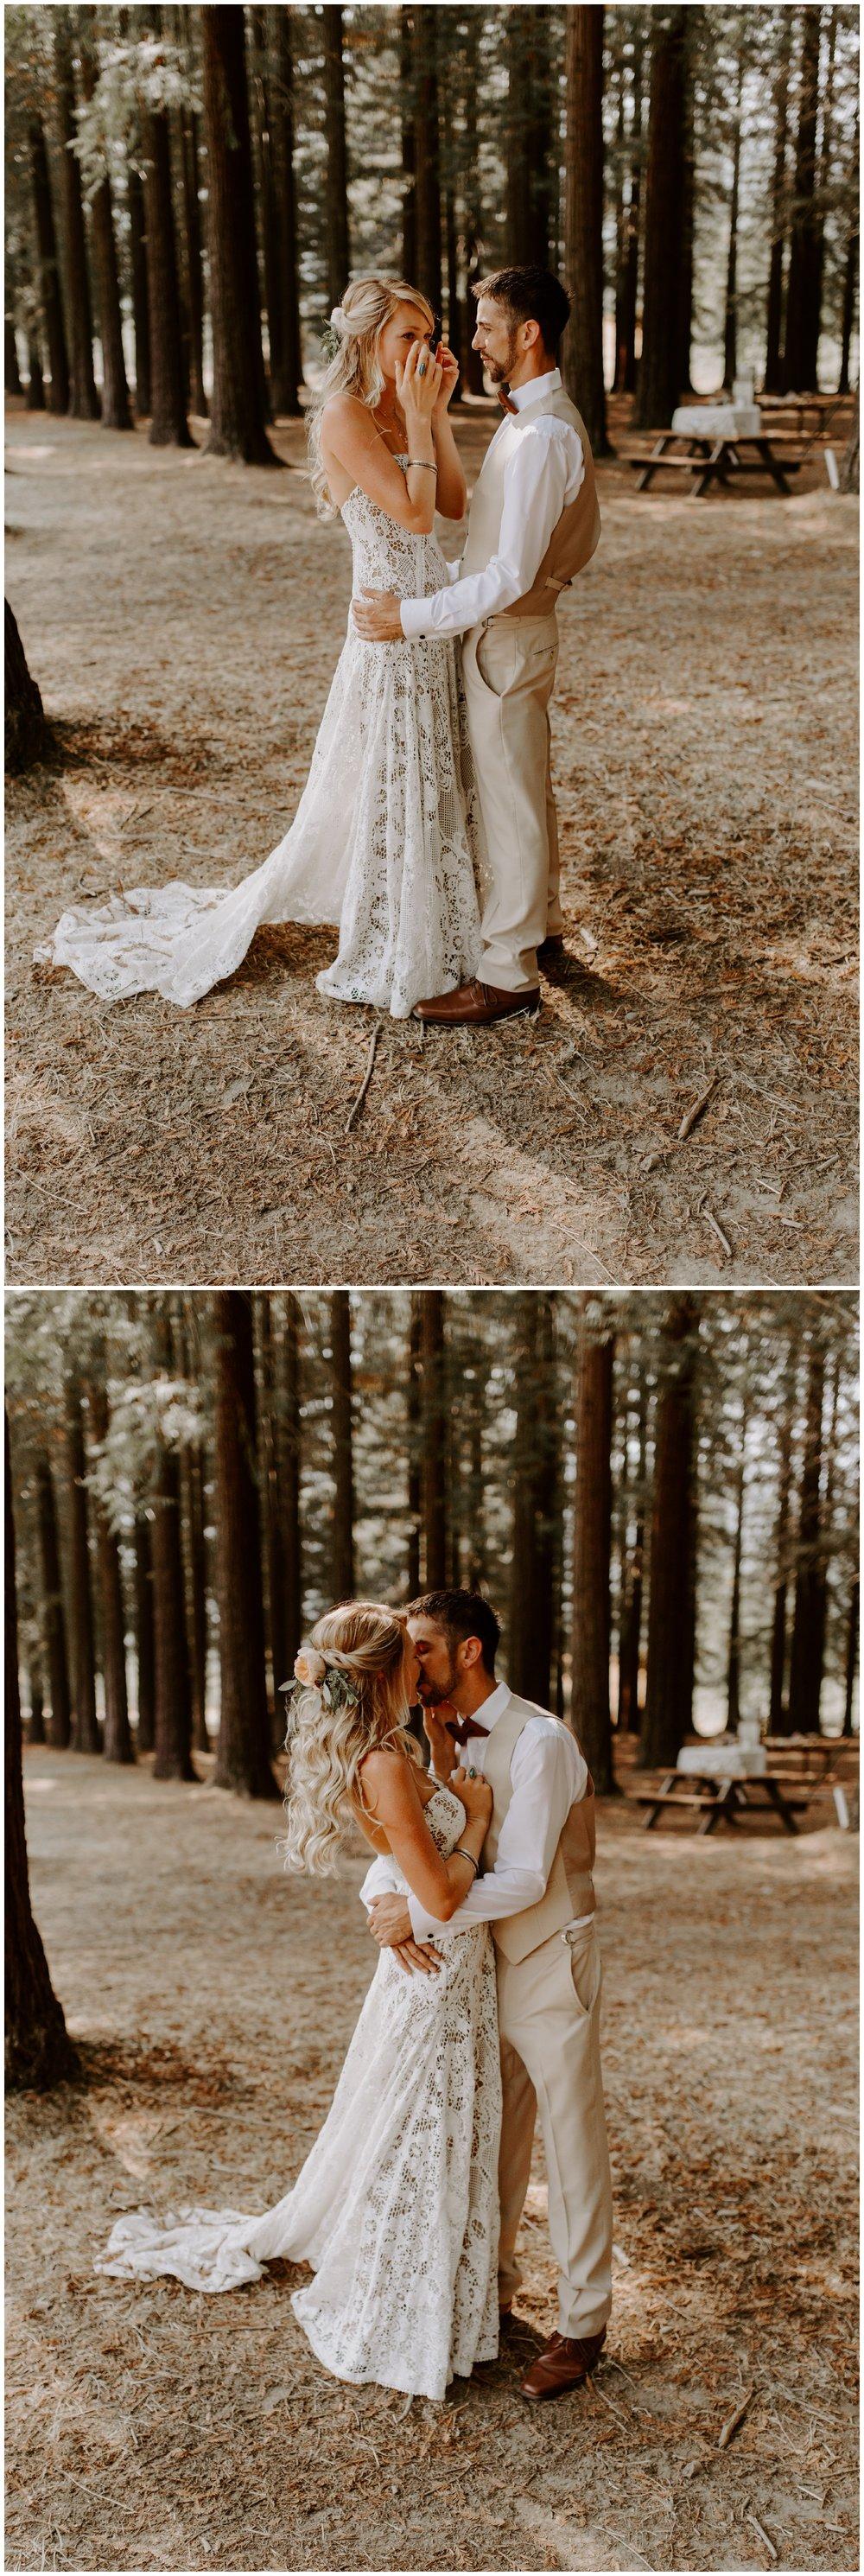 Redwood Festival Wedding Humbolt California - Jessica Heron Images_0013.jpg